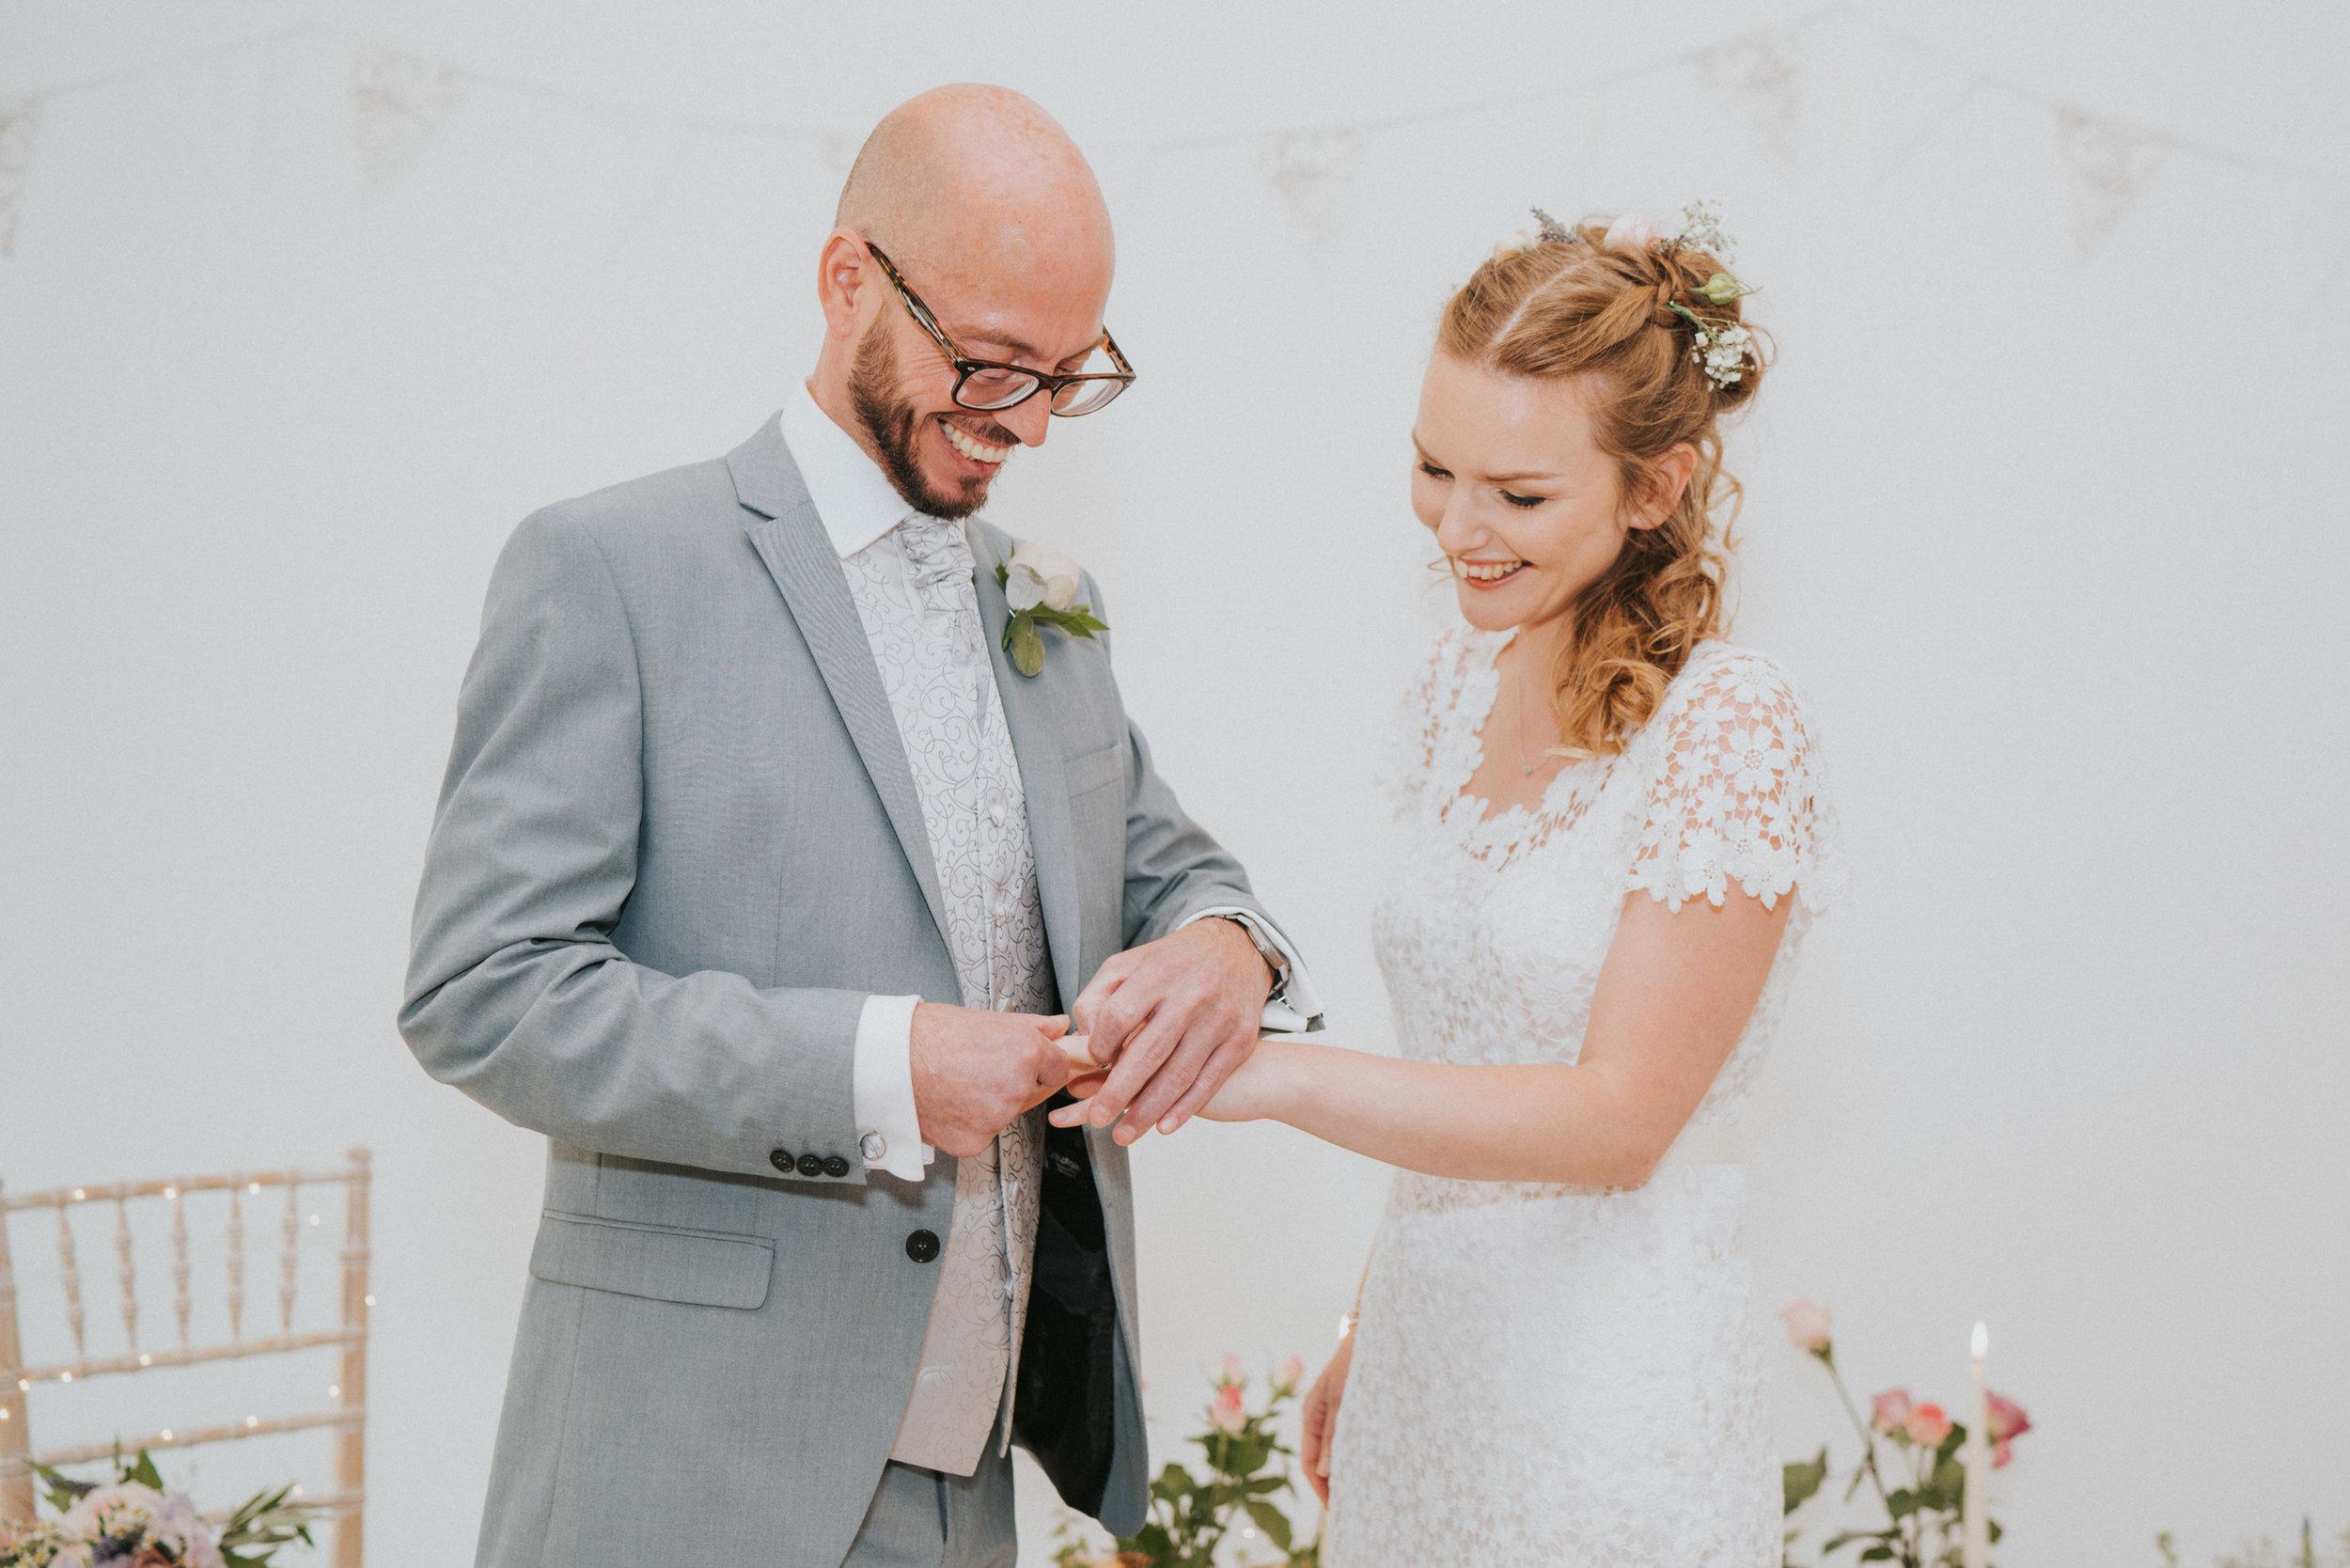 Grace-Elizabeth-Georgie-Amalaketu-Firstsite-Colchester-Essex-Boho-Buddhist-Wedding-Alternative-Wedding-Photography-Essex (59 of 100).jpg